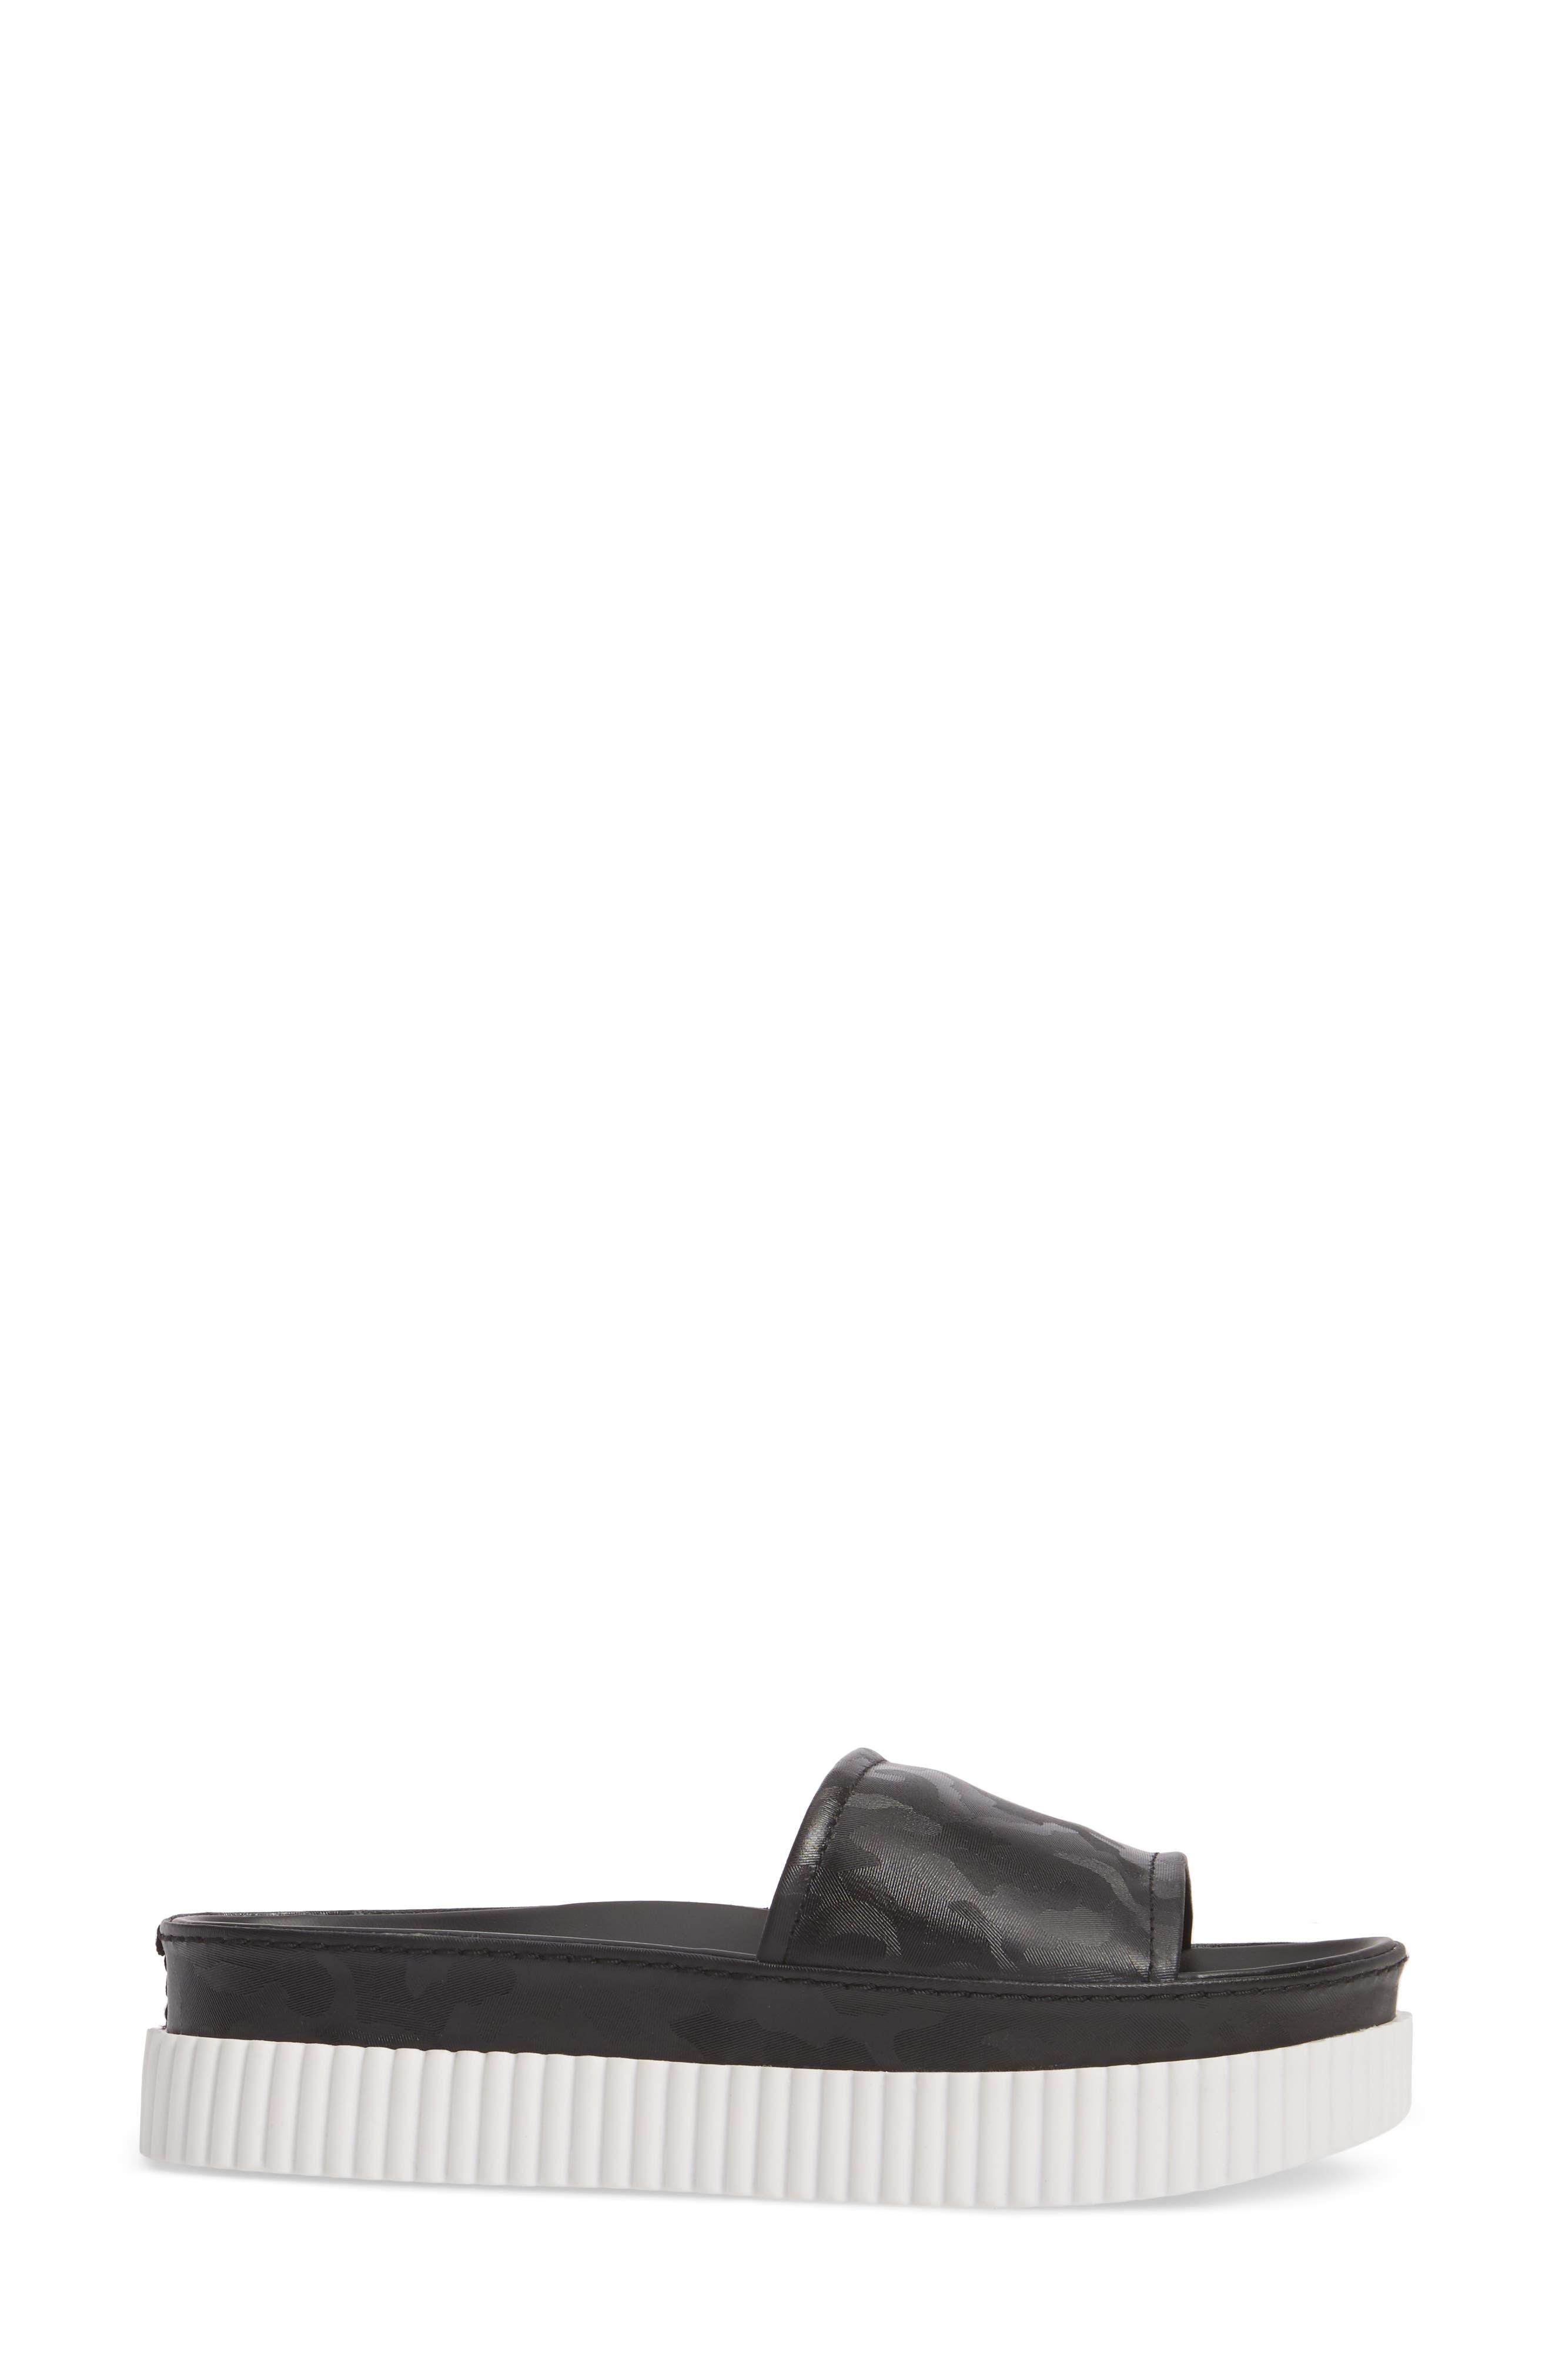 Isla Pool Slide Sandal,                             Alternate thumbnail 3, color,                             Black/ Camo